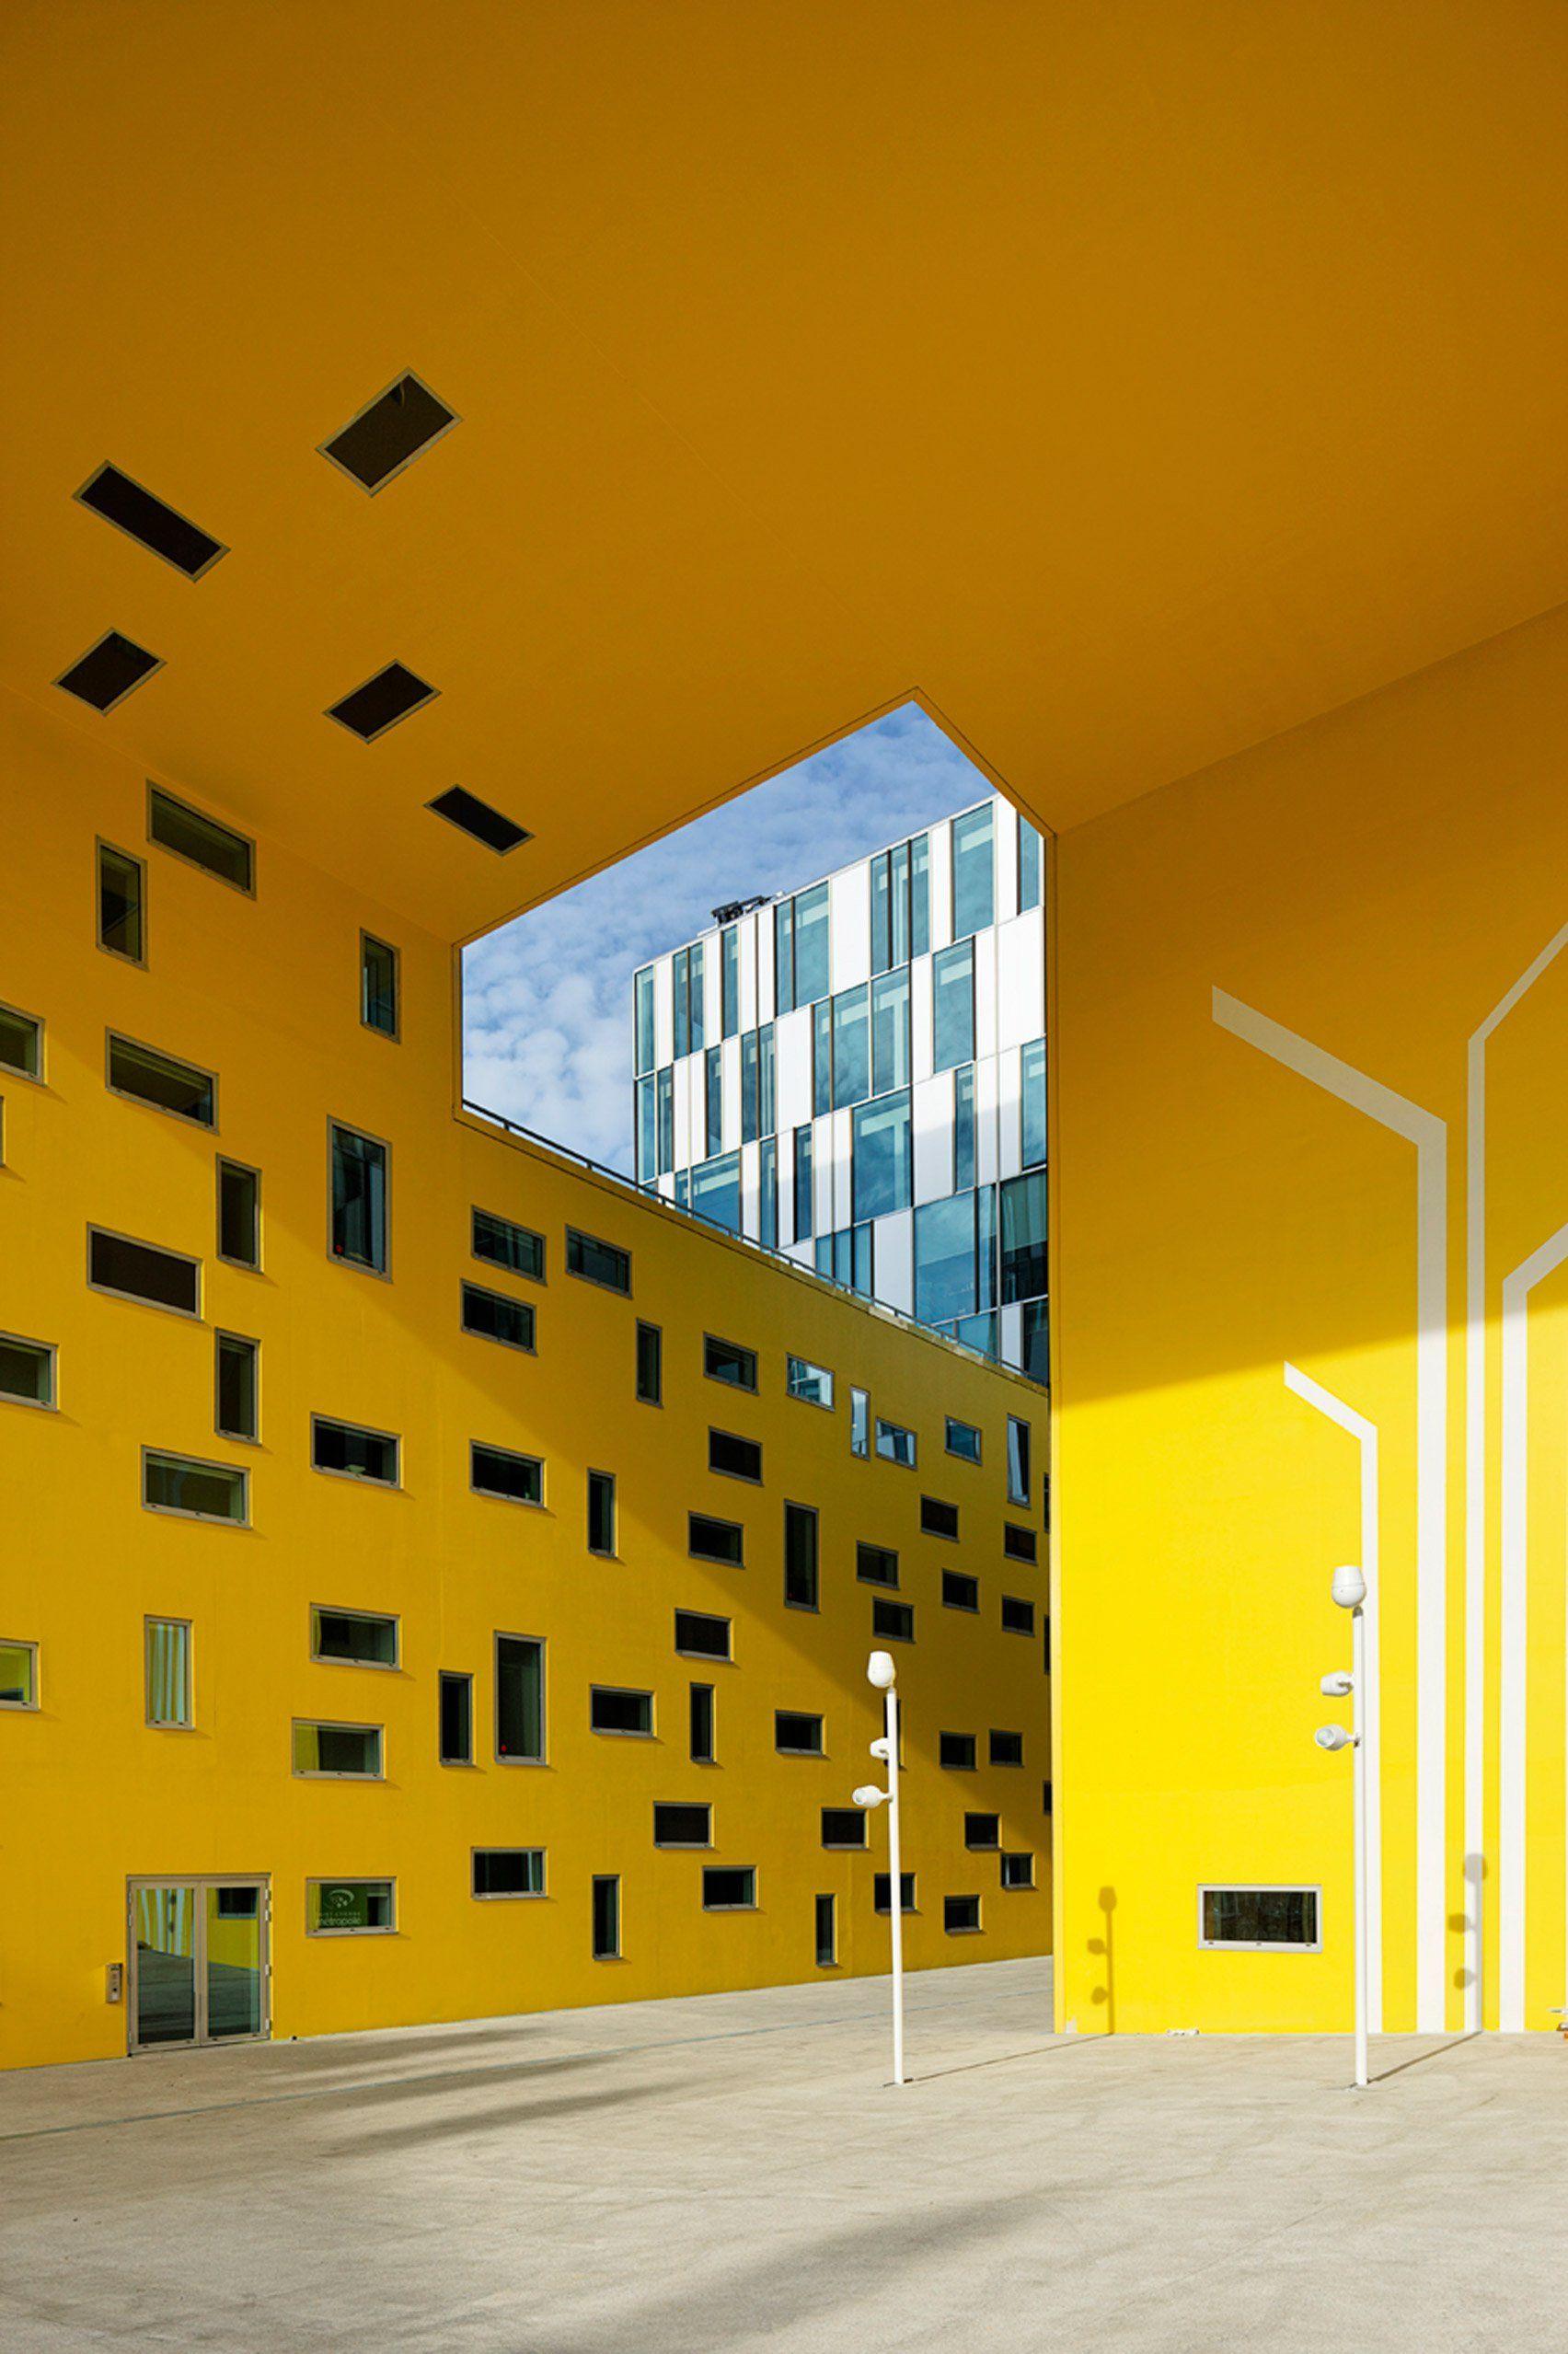 Free photo: Large Yellow Building - Structure, Wedding cake house ...